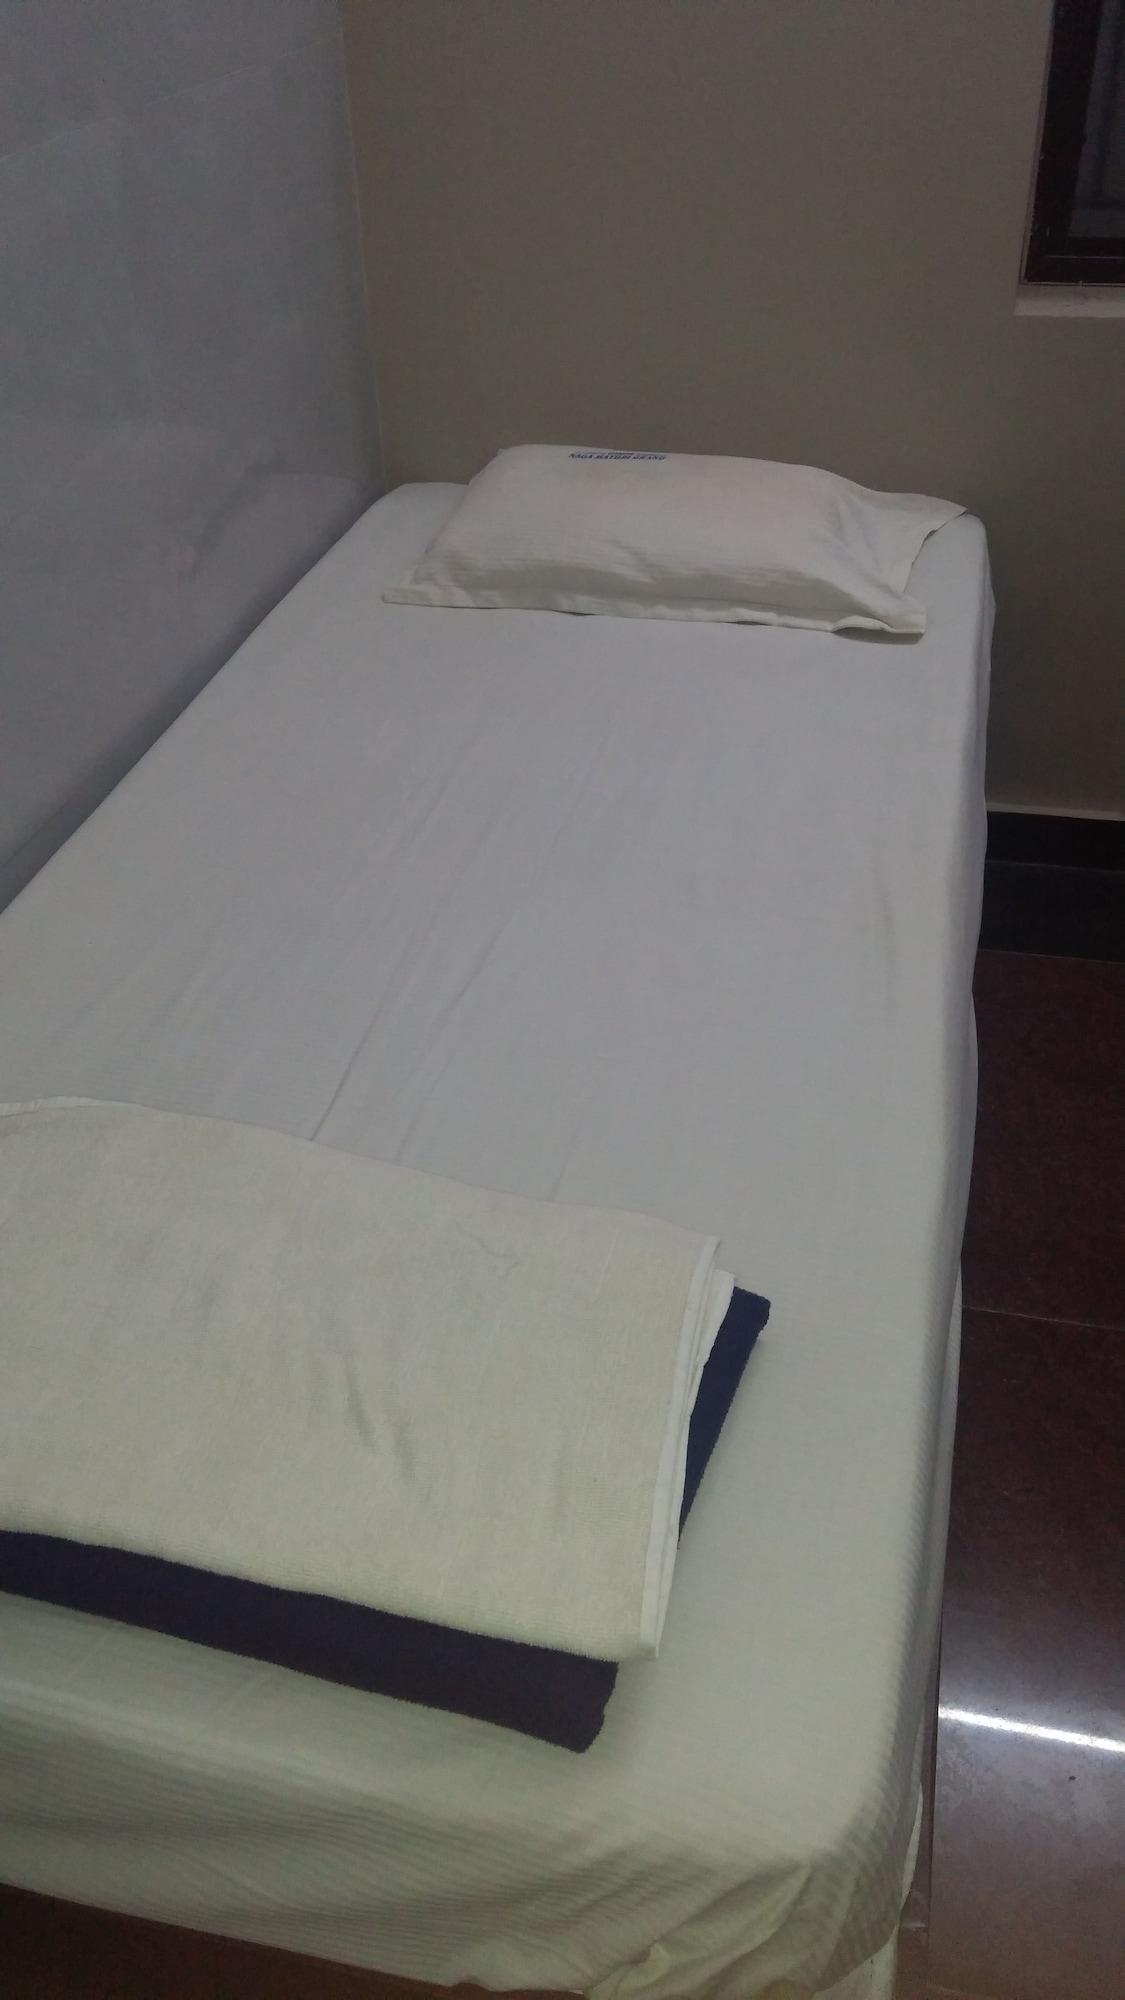 Iroomz NVR Hotels Luxury Redefined, Kurnool